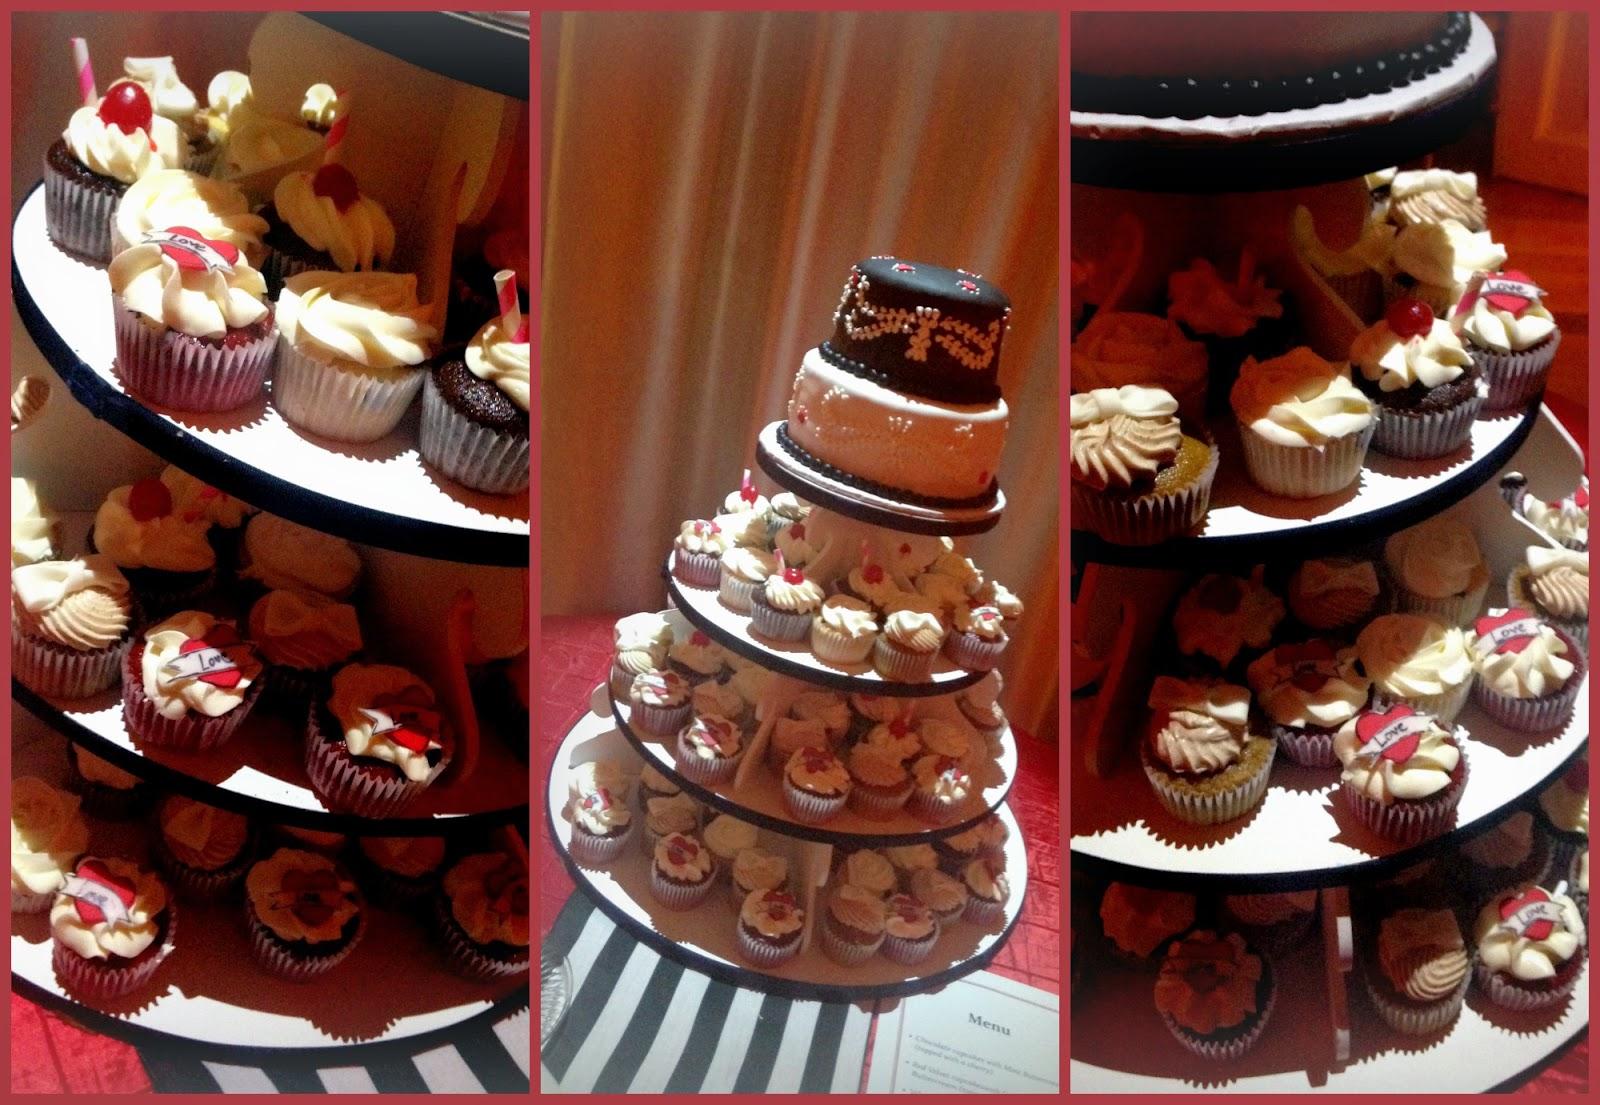 Cupcake Novelties Cakes Cupcakes Wedding Cakes Cake Pops